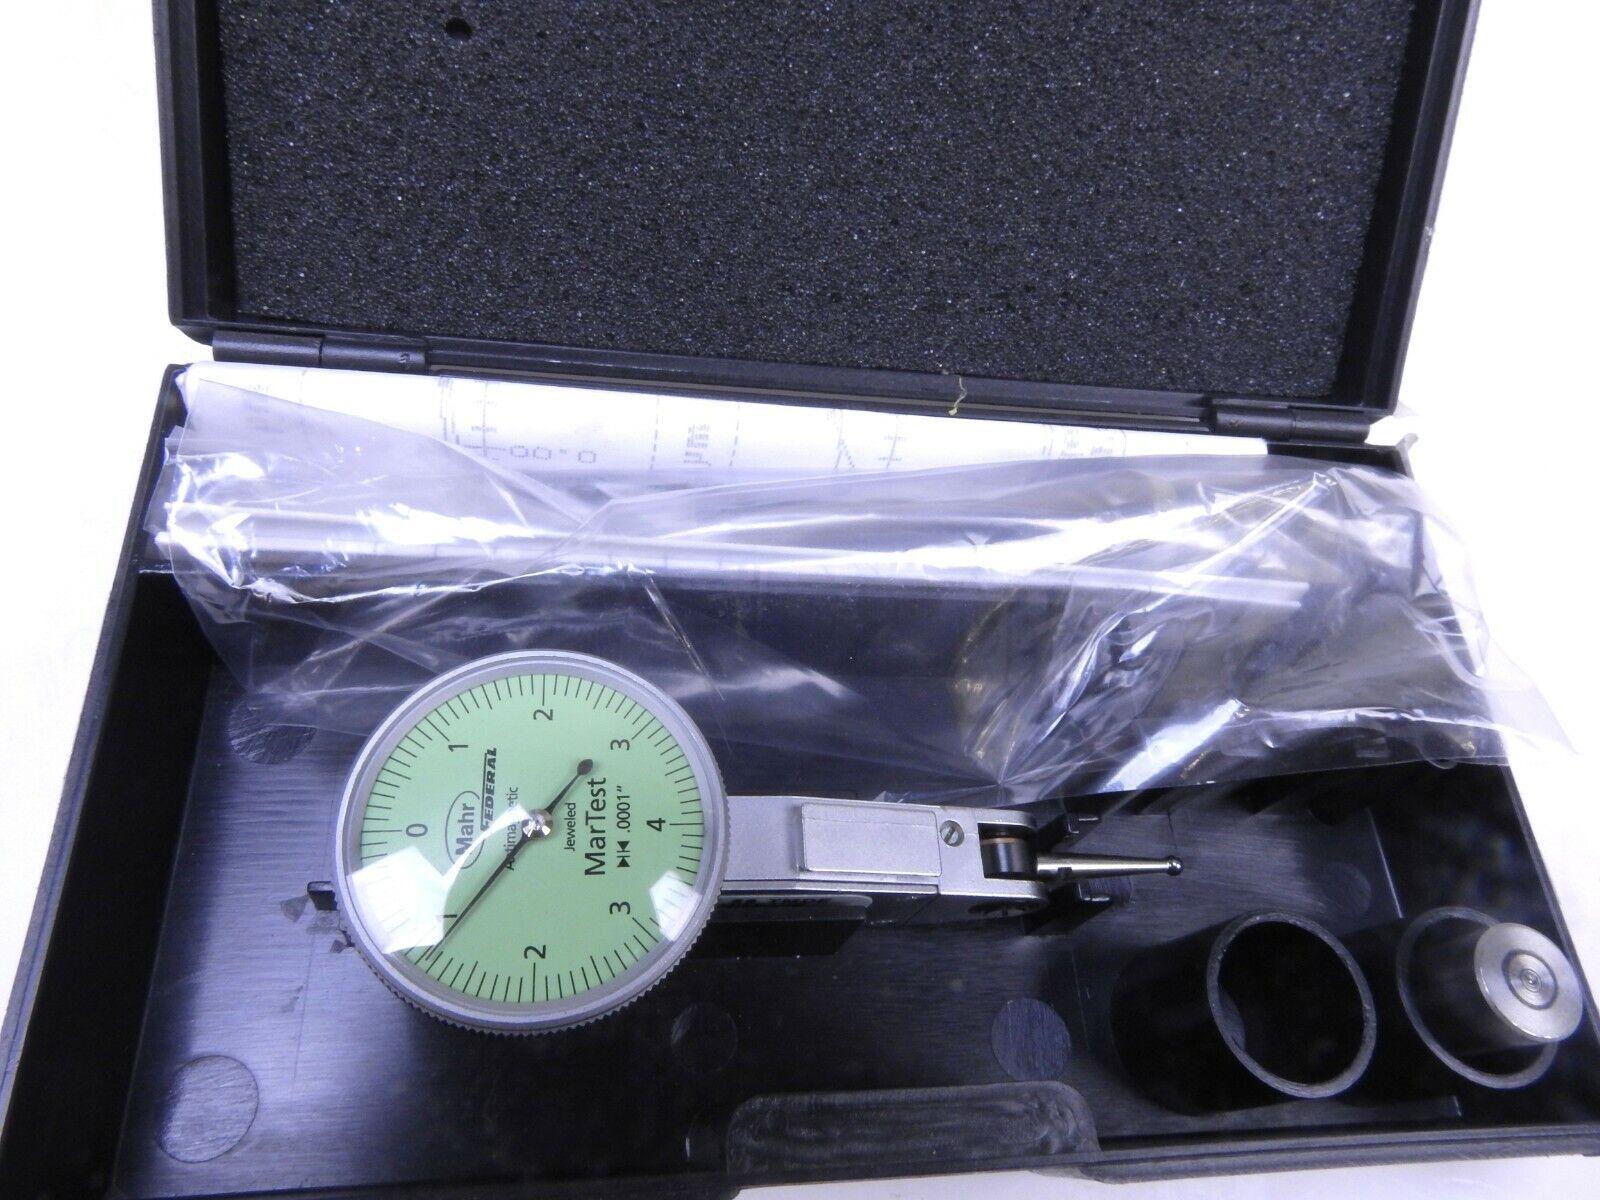 Mahr Martest 801SM 0-40-0 Dial Test Indicator Kit